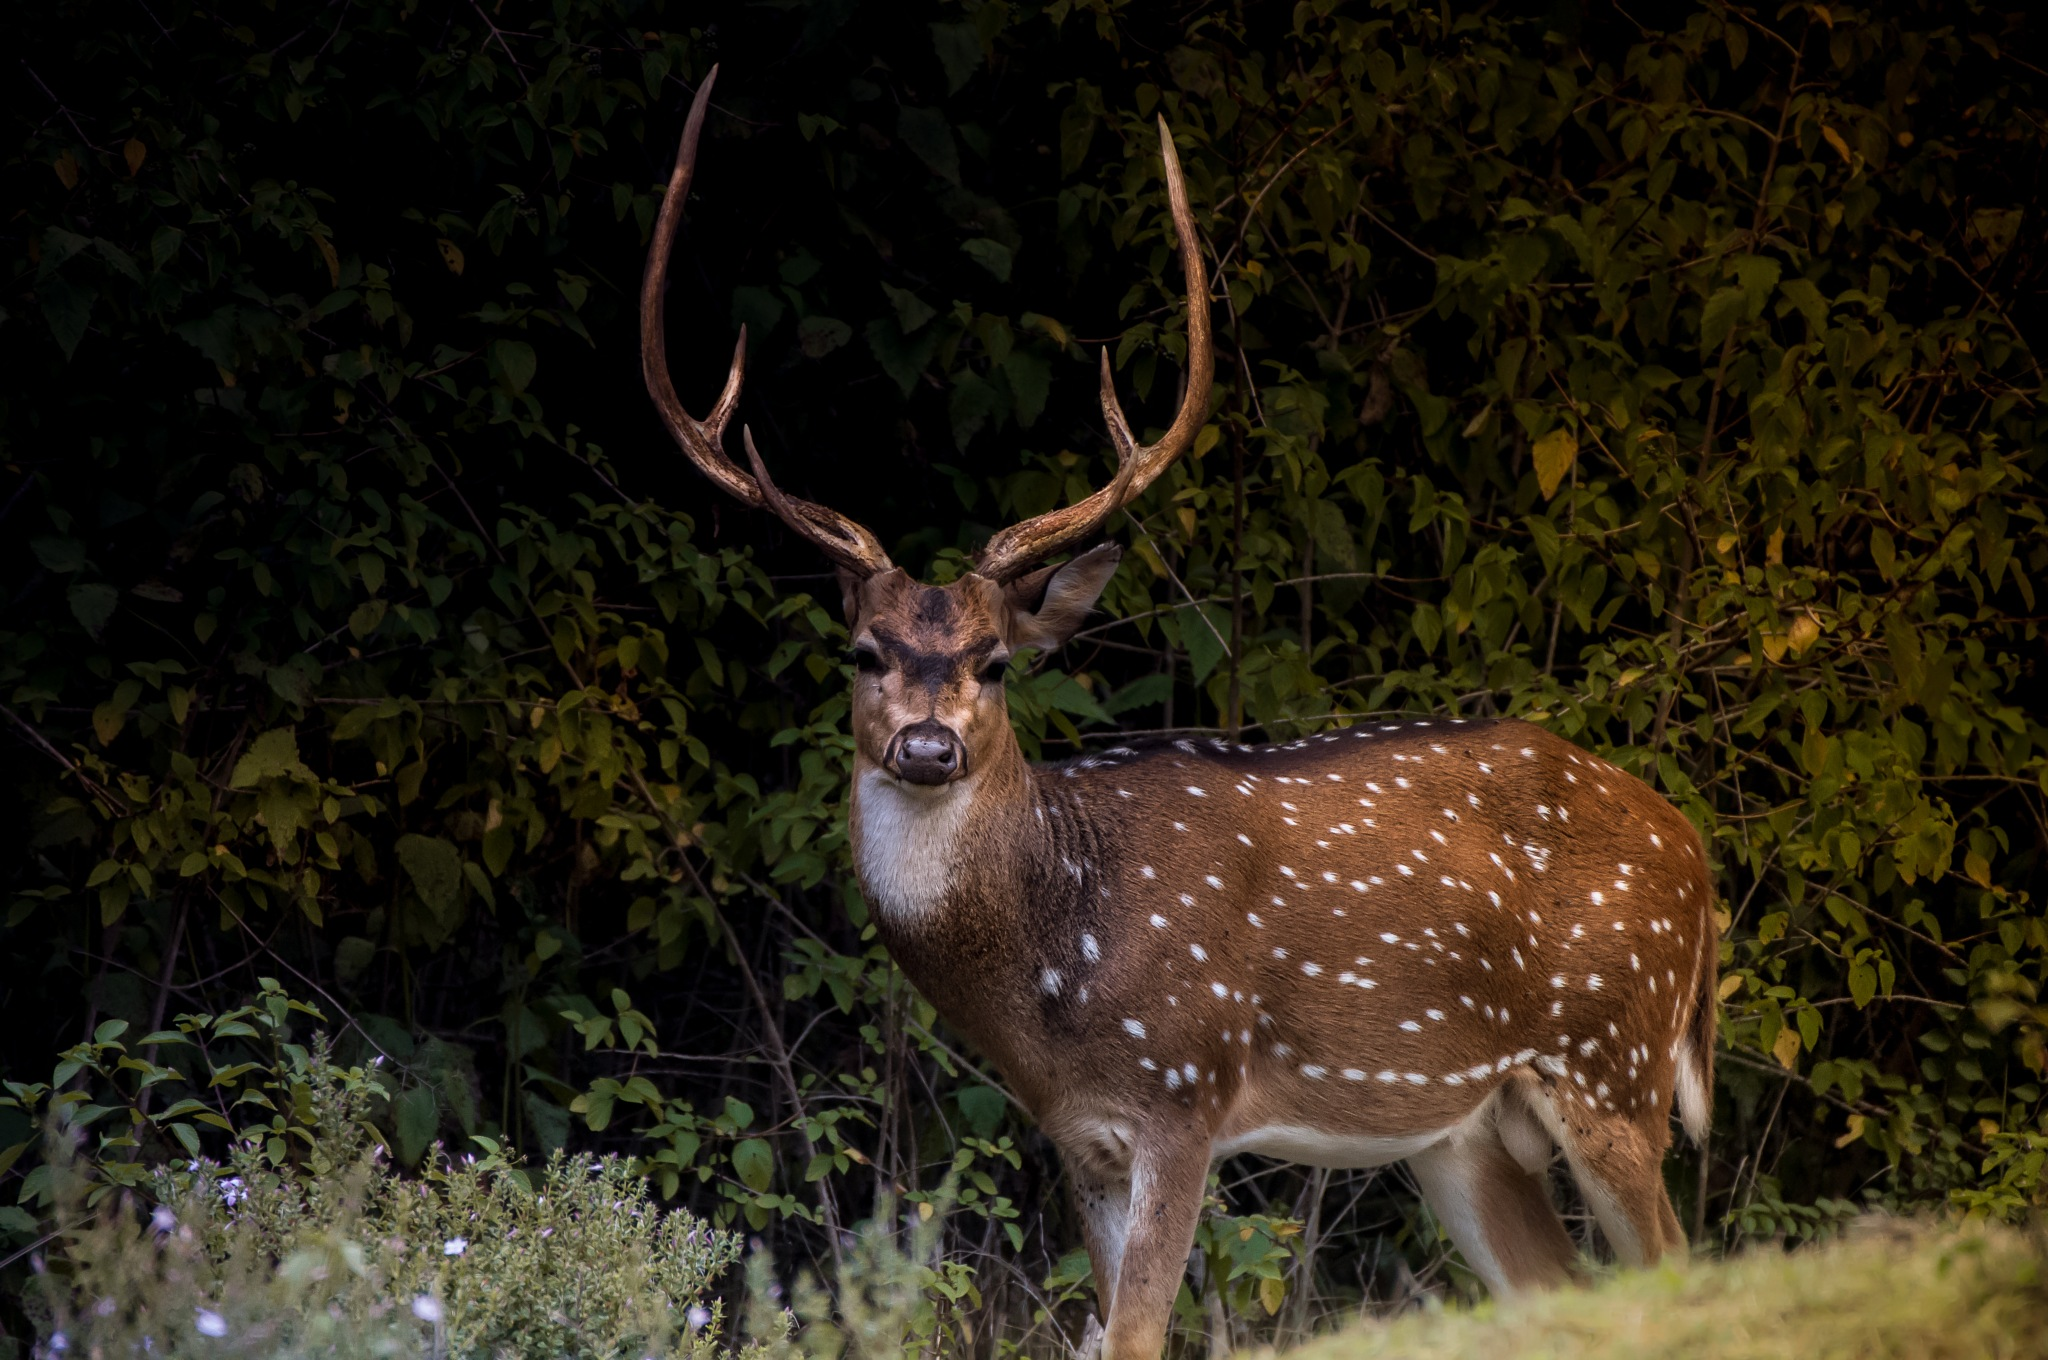 Male Spotted Deer by Jubin Sobhan Das